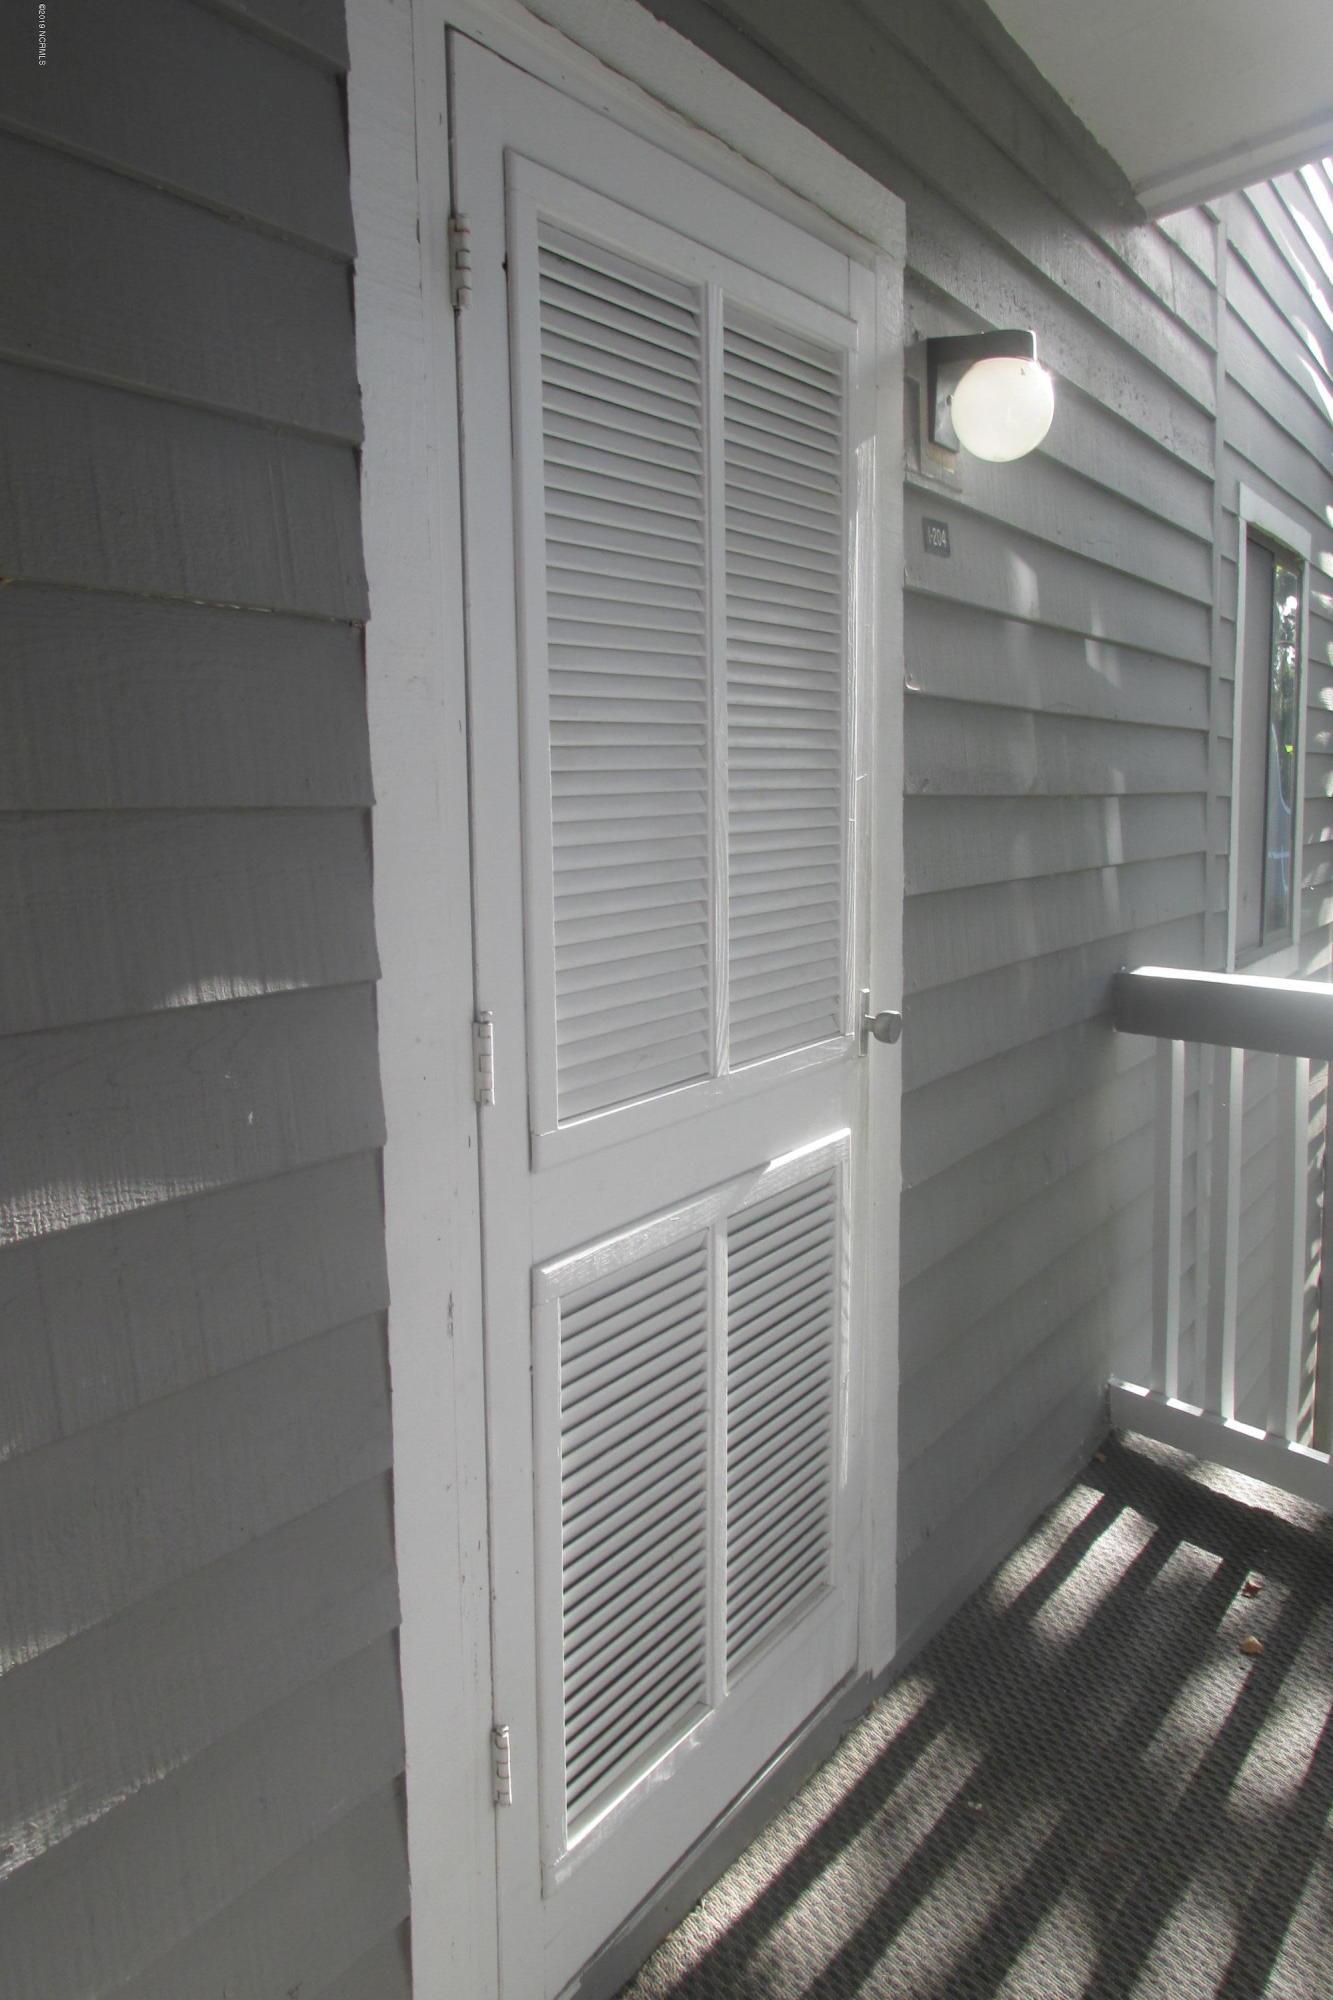 Carolina Plantations Real Estate - MLS Number: 100150206